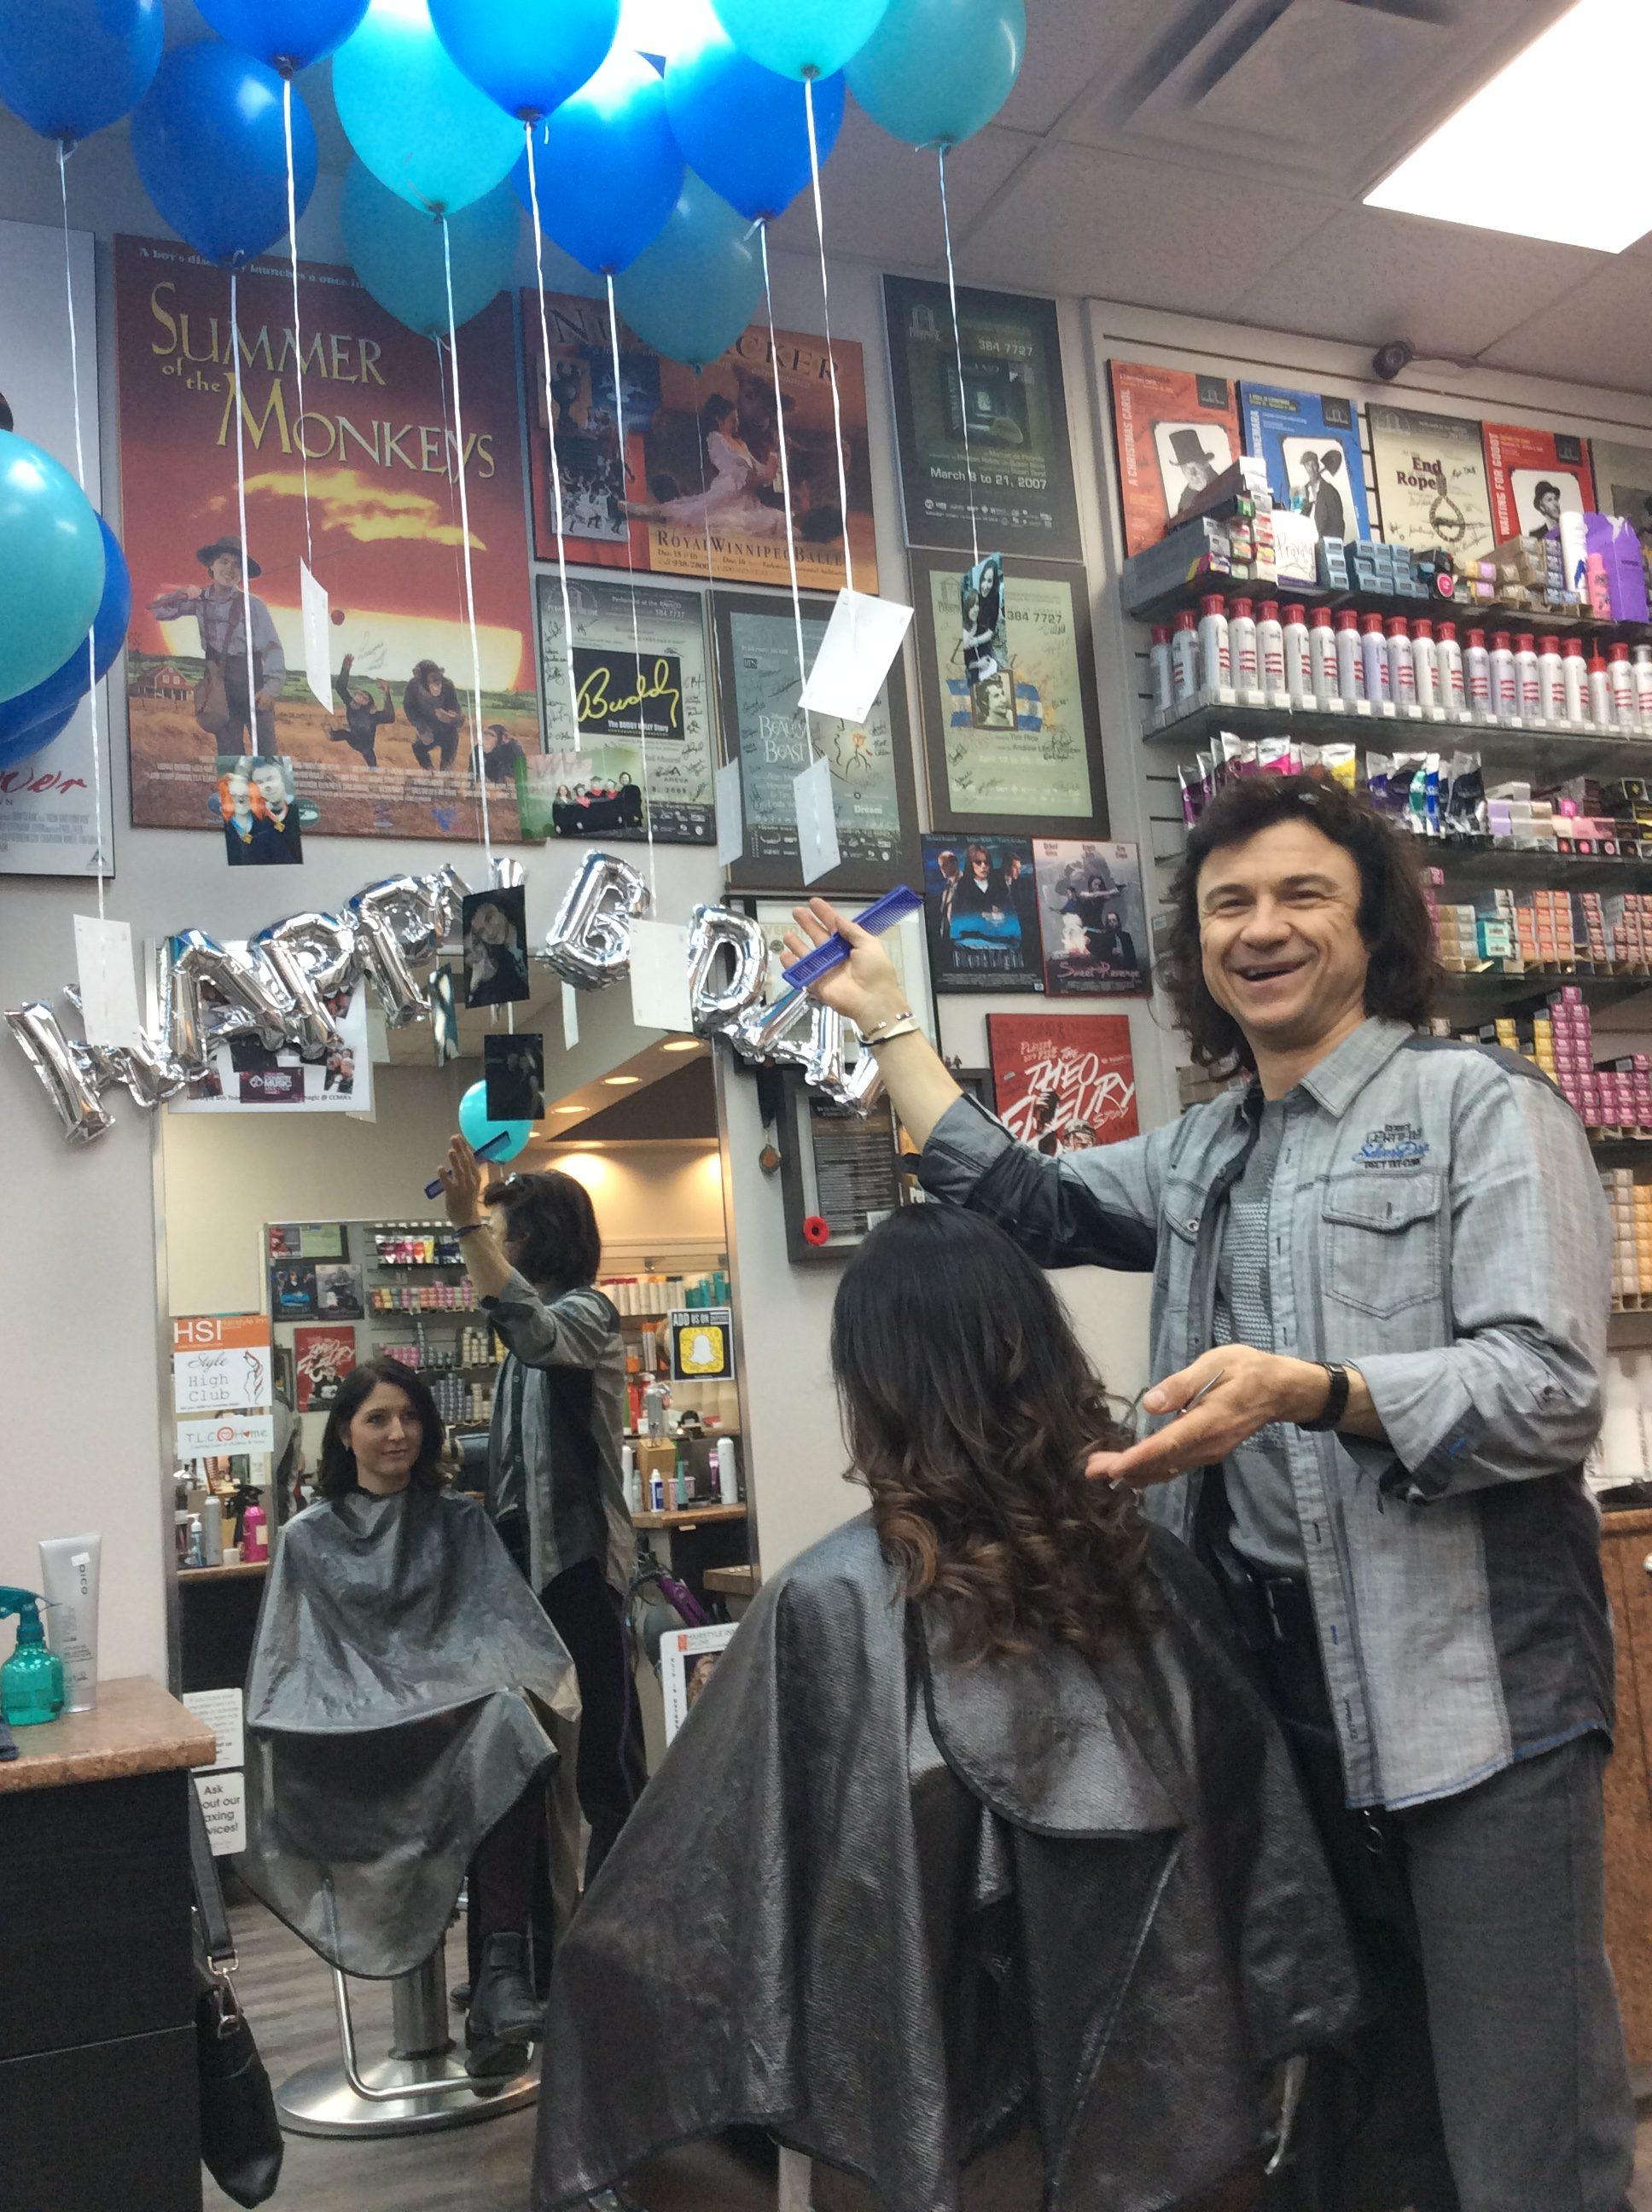 Blue balloons and birthday decoration at hairstyle inn saskatoon